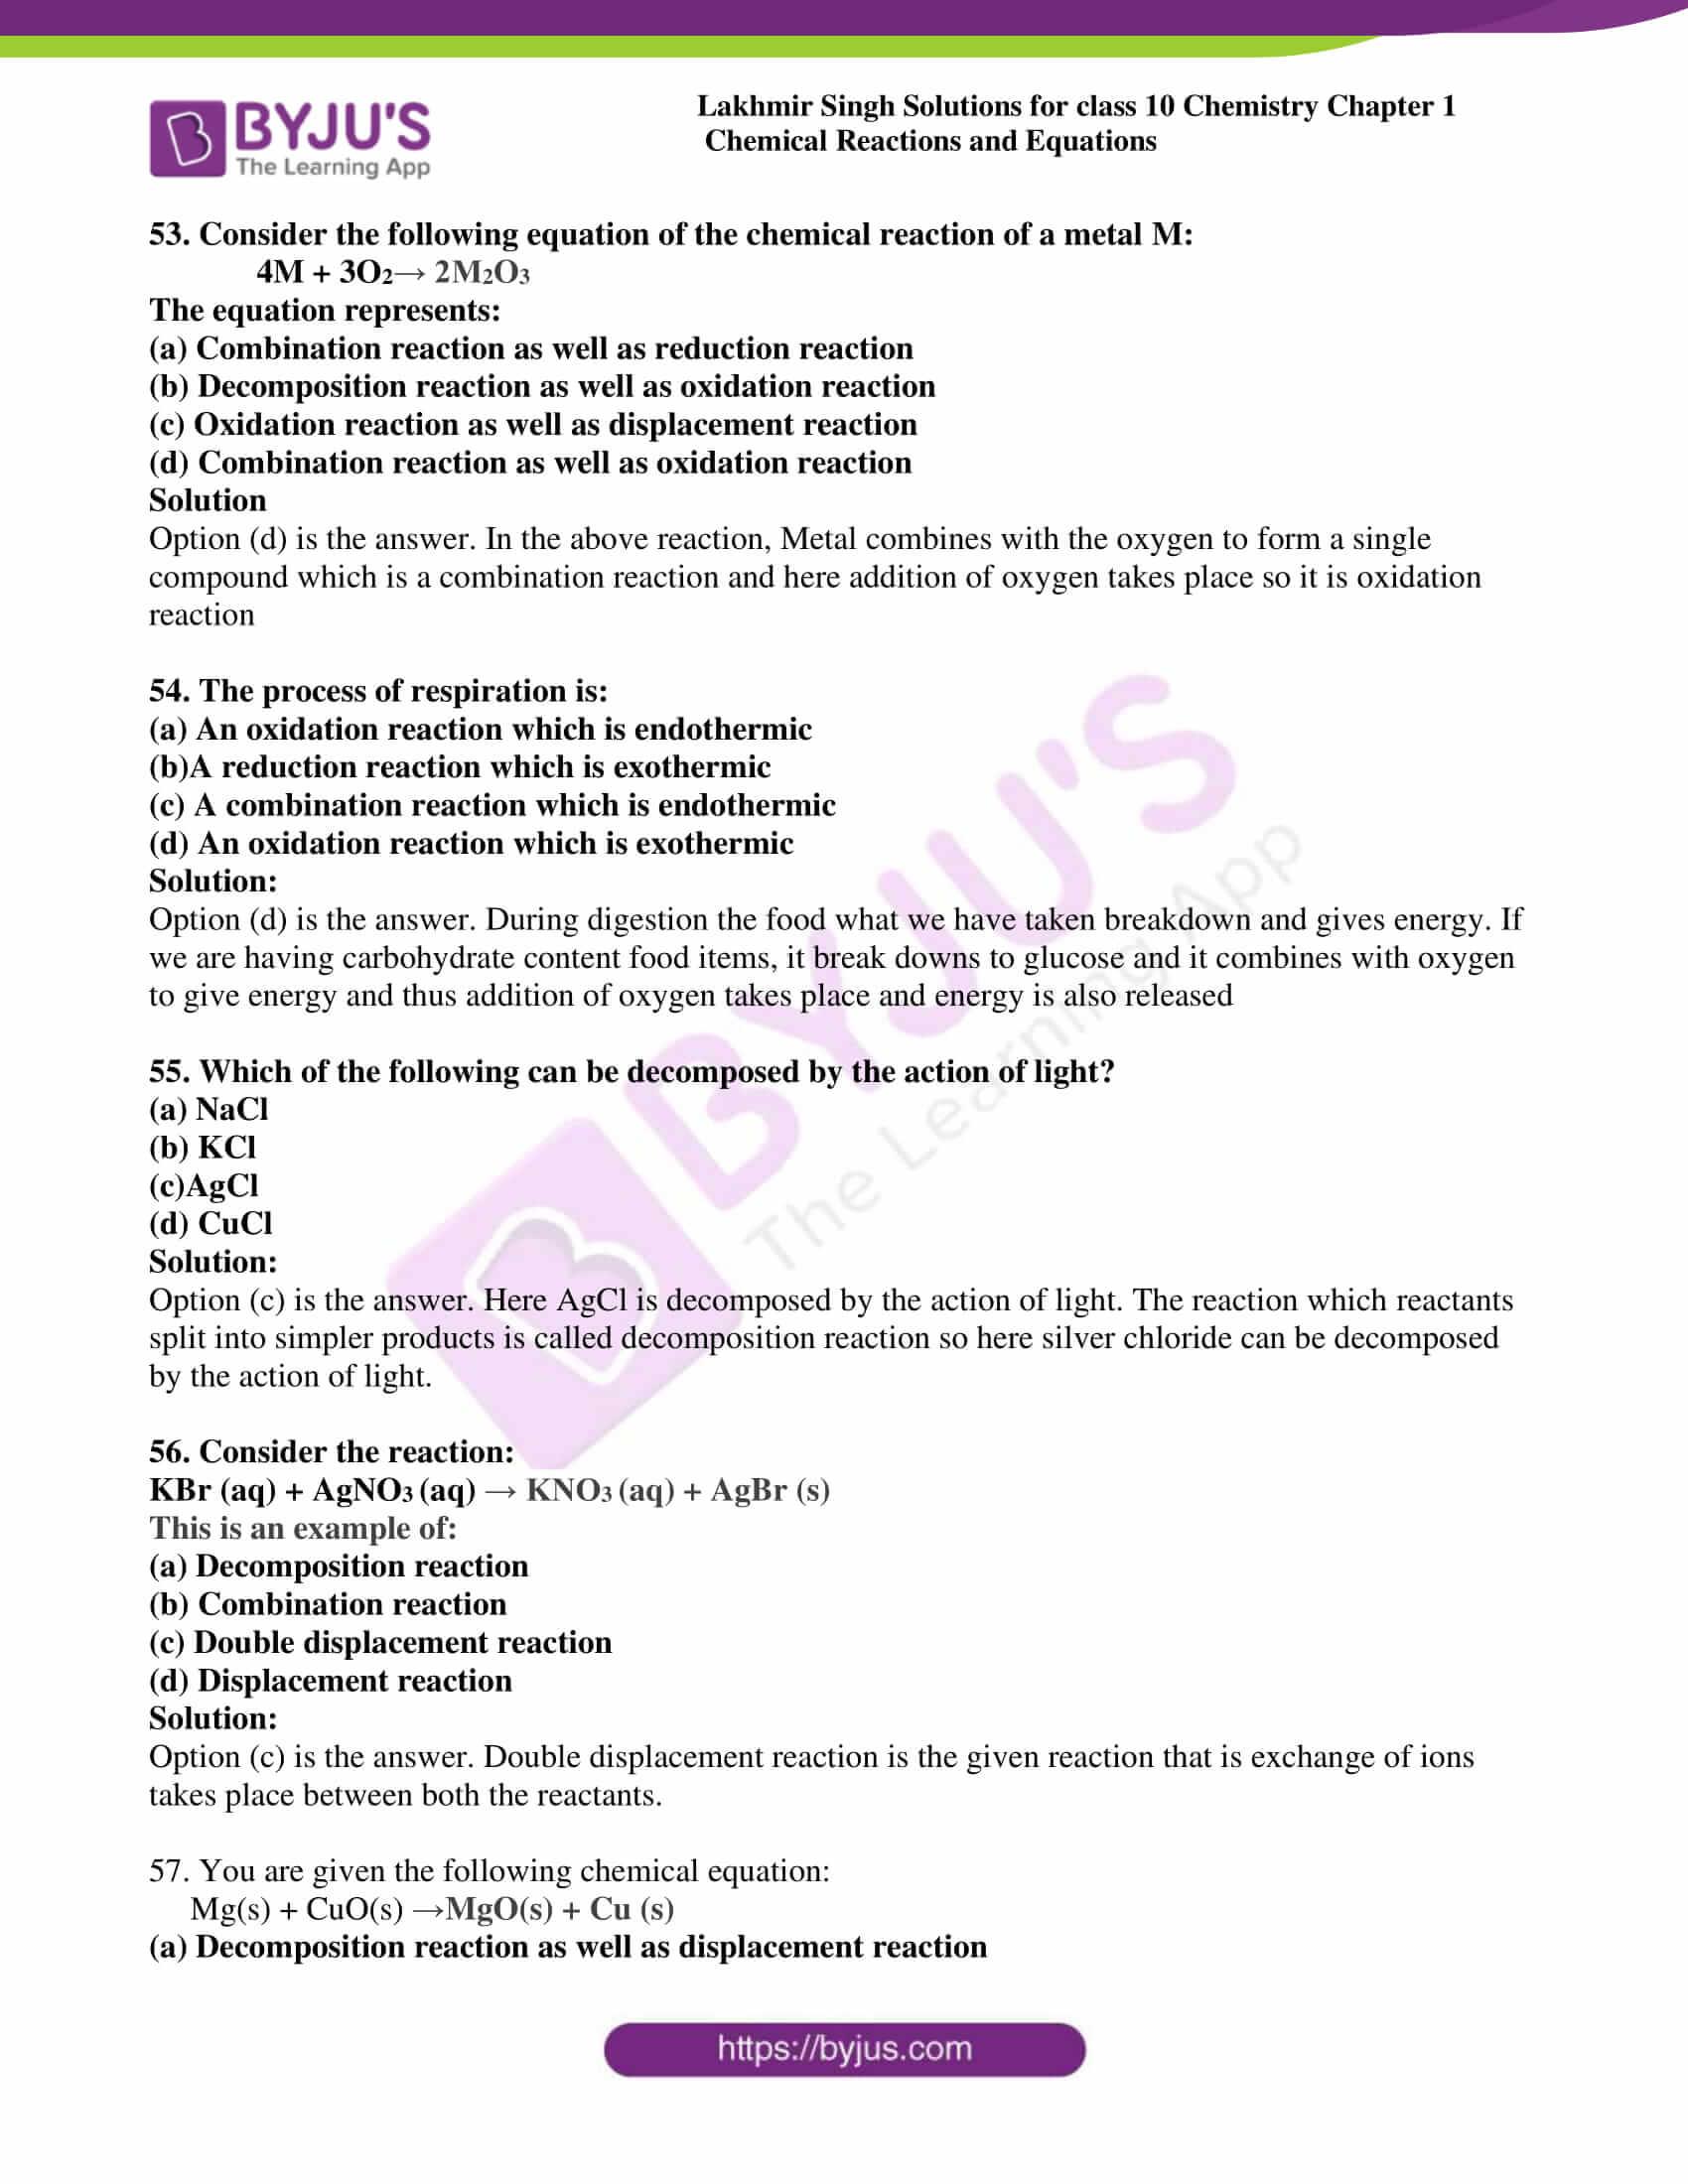 lakhmir singh sol class 10 che chapter 1 28